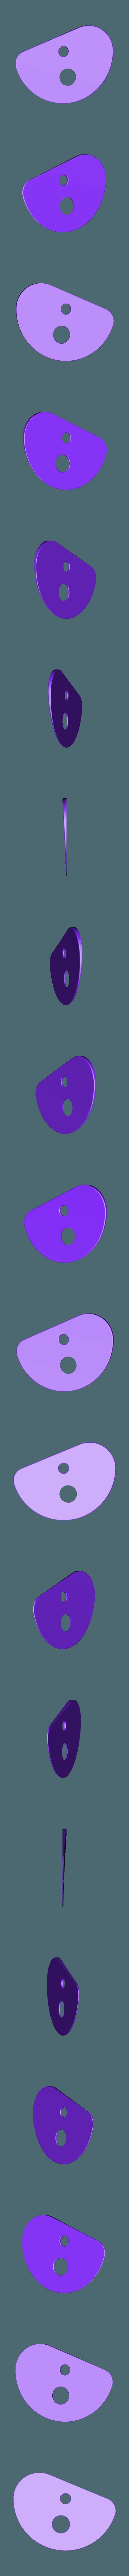 Round_Scraper_v1-1.STL Download free STL file Round Scraper • 3D printing template, WalterHsiao